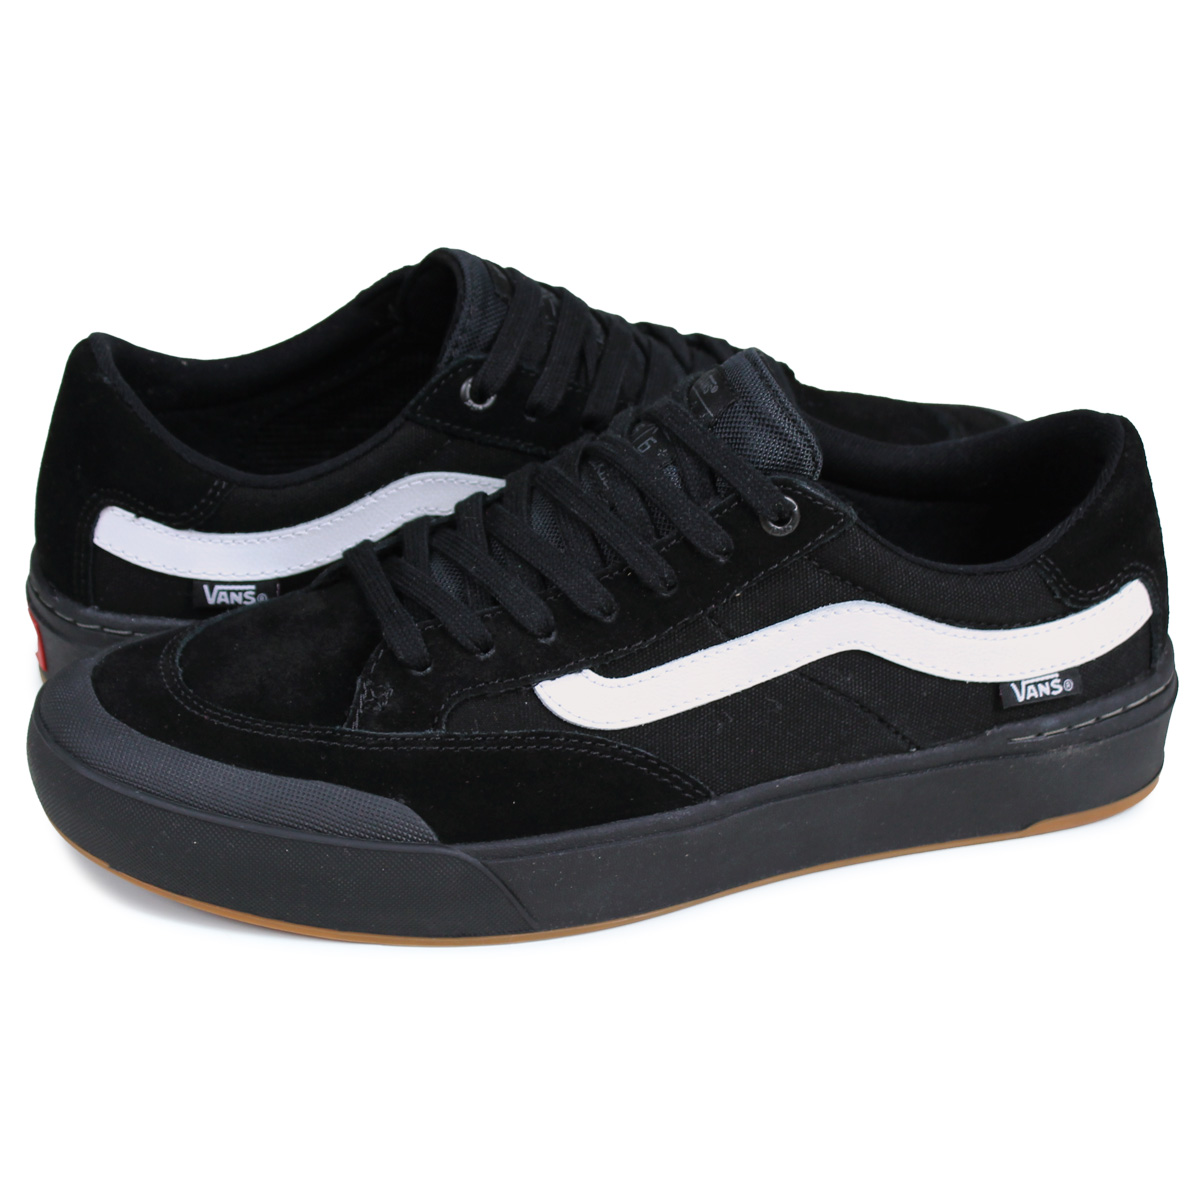 VANS PRO SKATE vans Elijah bar pro BERLE PRO [BLACKBLACKWHITE VN0A3WKXB8C] men suede sneakers black white black and white skateboarding shoes